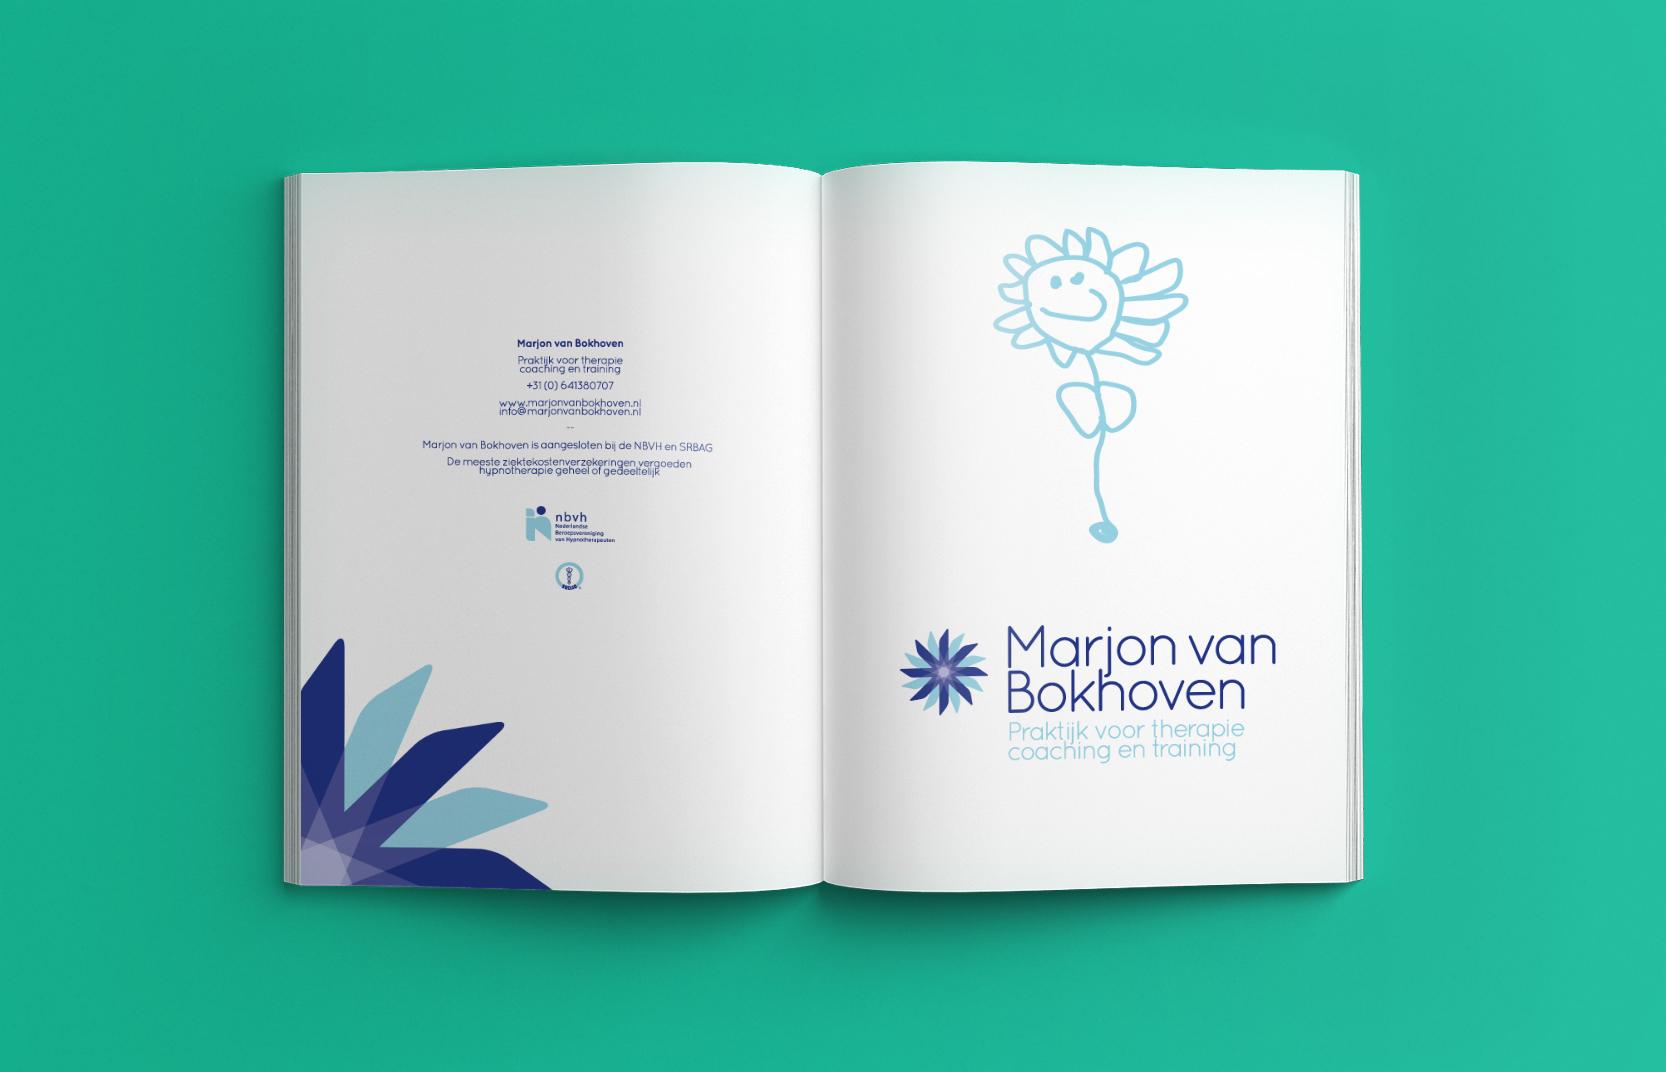 multi_marjonvanbokhoven_magazine